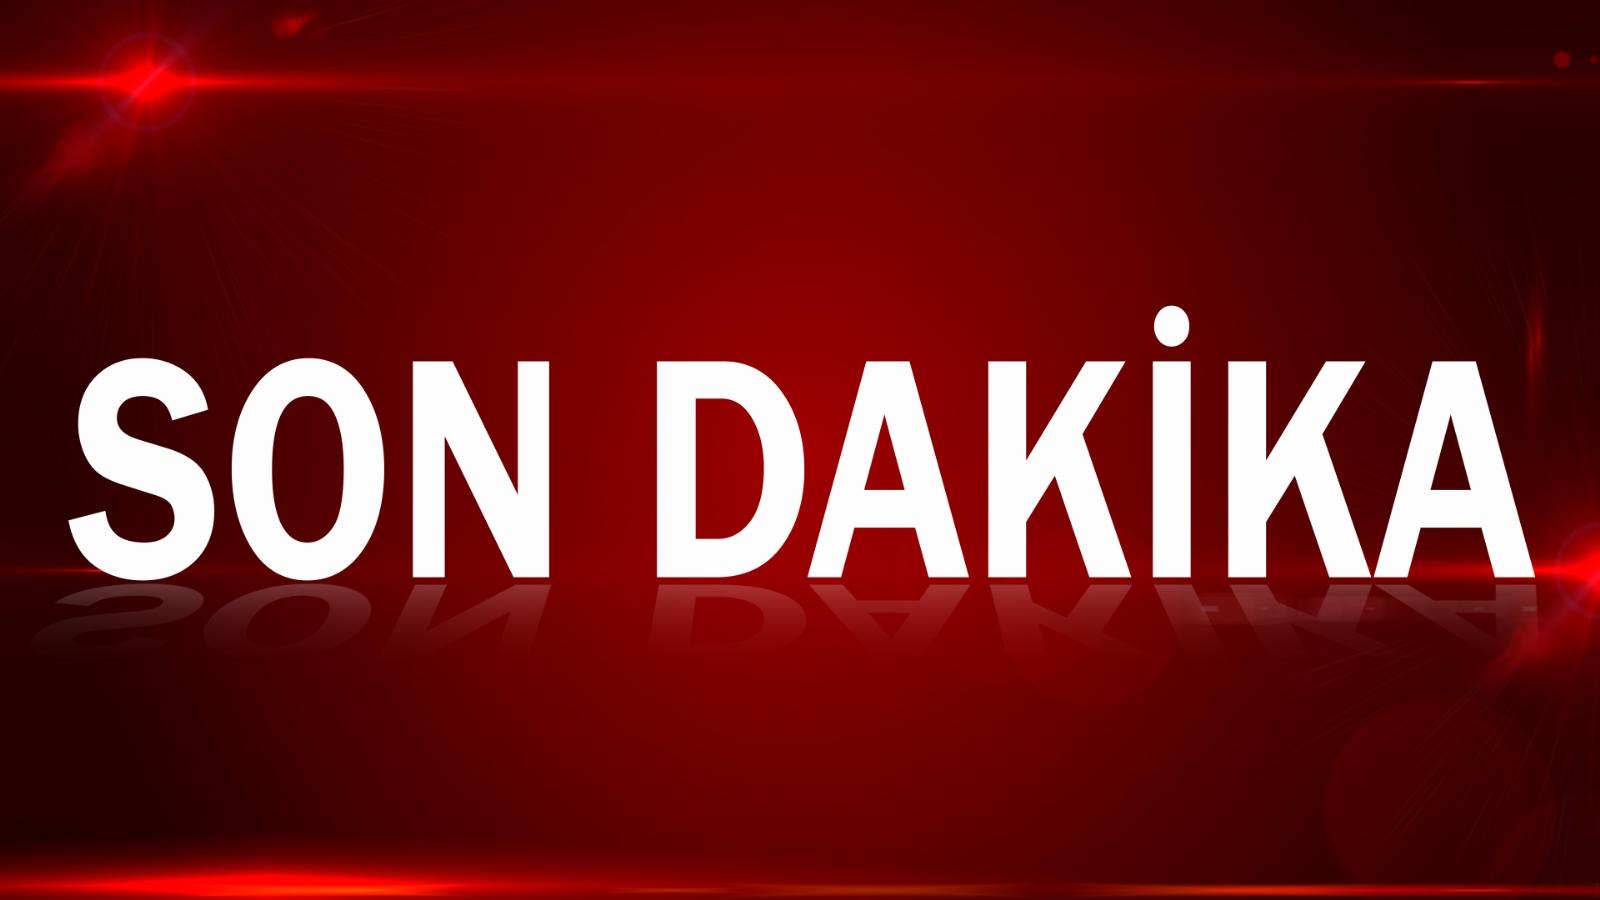 Milli Savunma Bakanı Hulusi Akar'ın Bulunduğu Uçak Adana'ya Acil İniş Yaptı